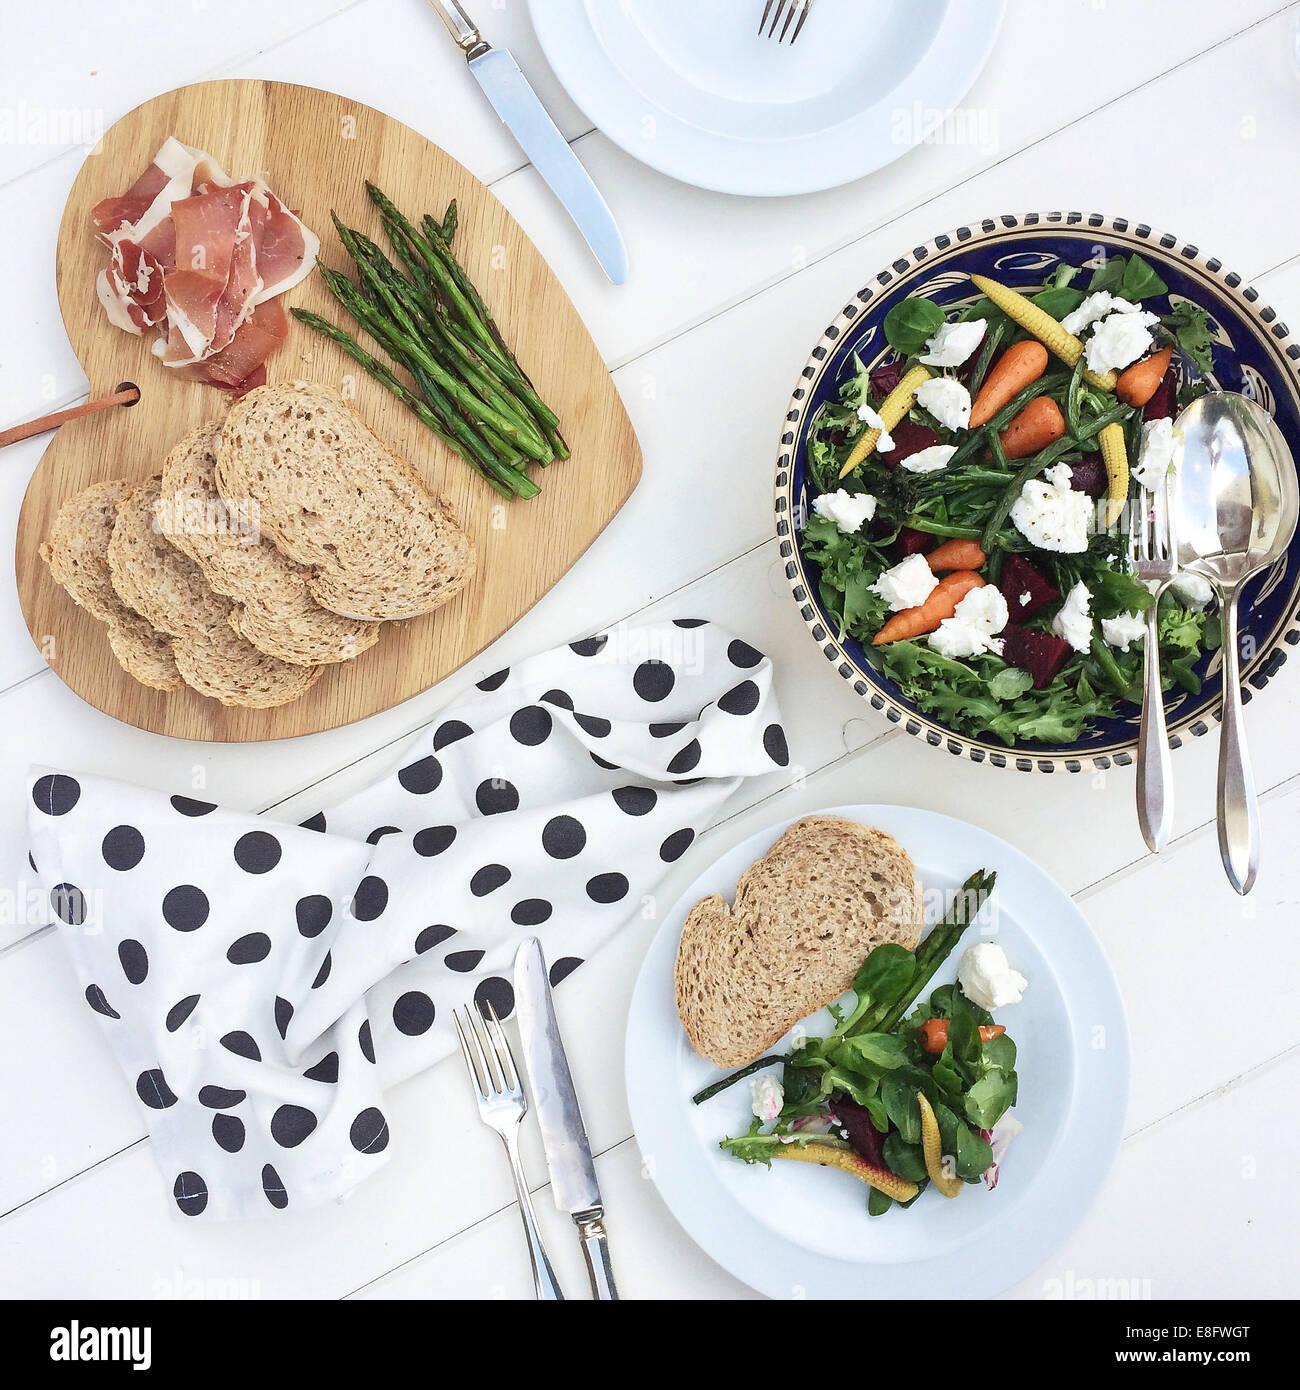 Bread, parma ham and salad - Stock Image